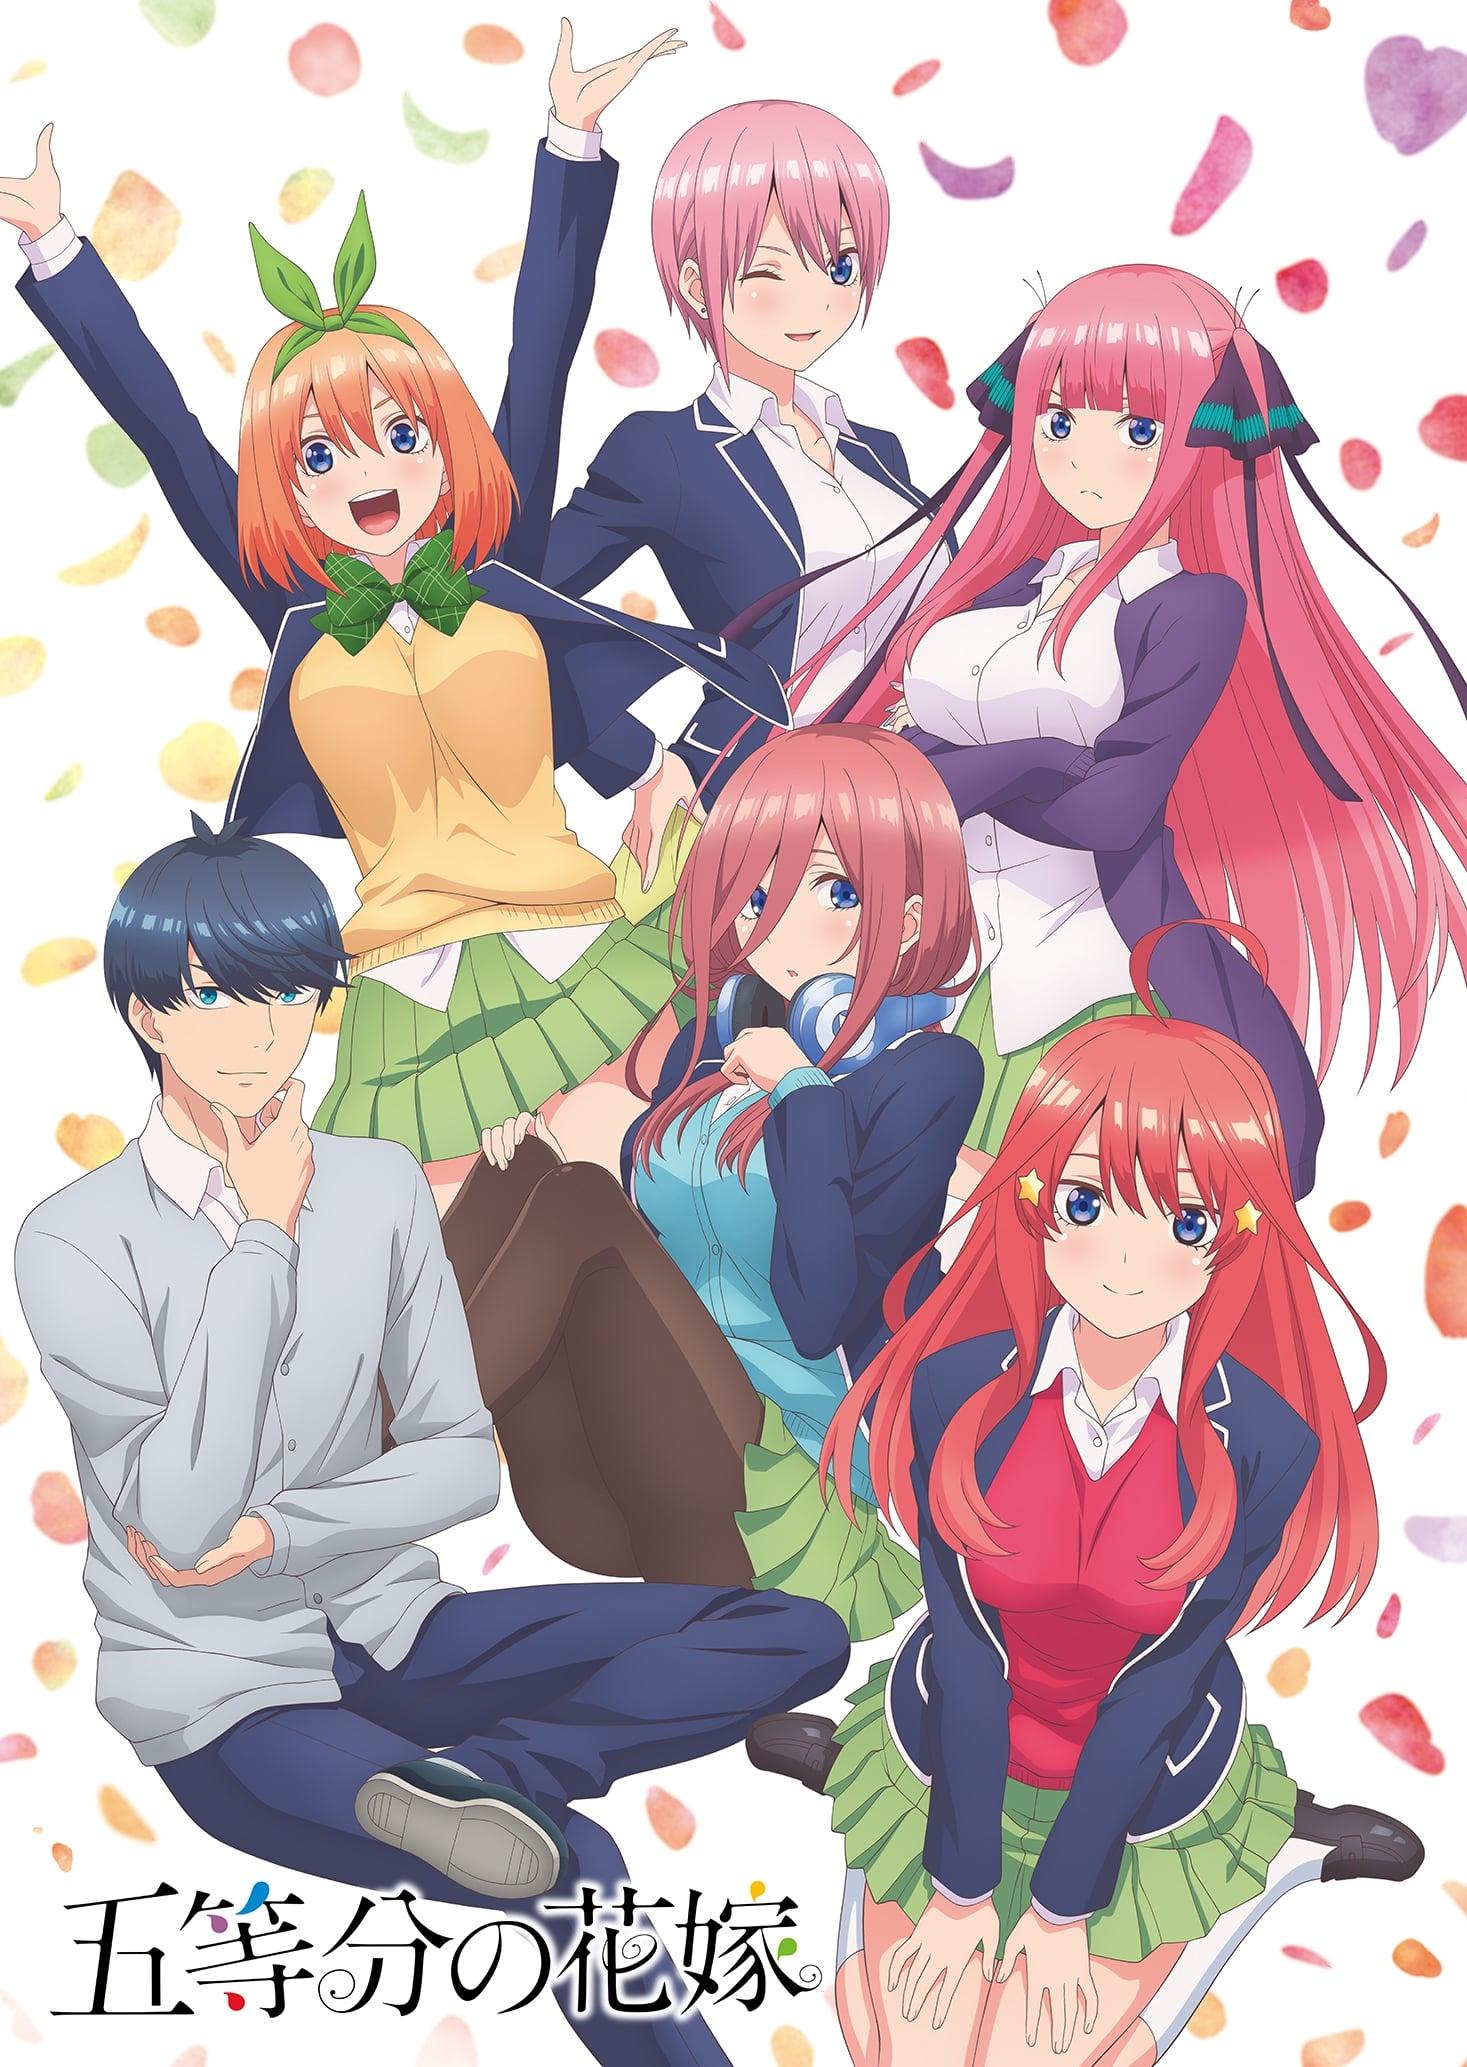 Go-Toubun no Hanayome series tv complet